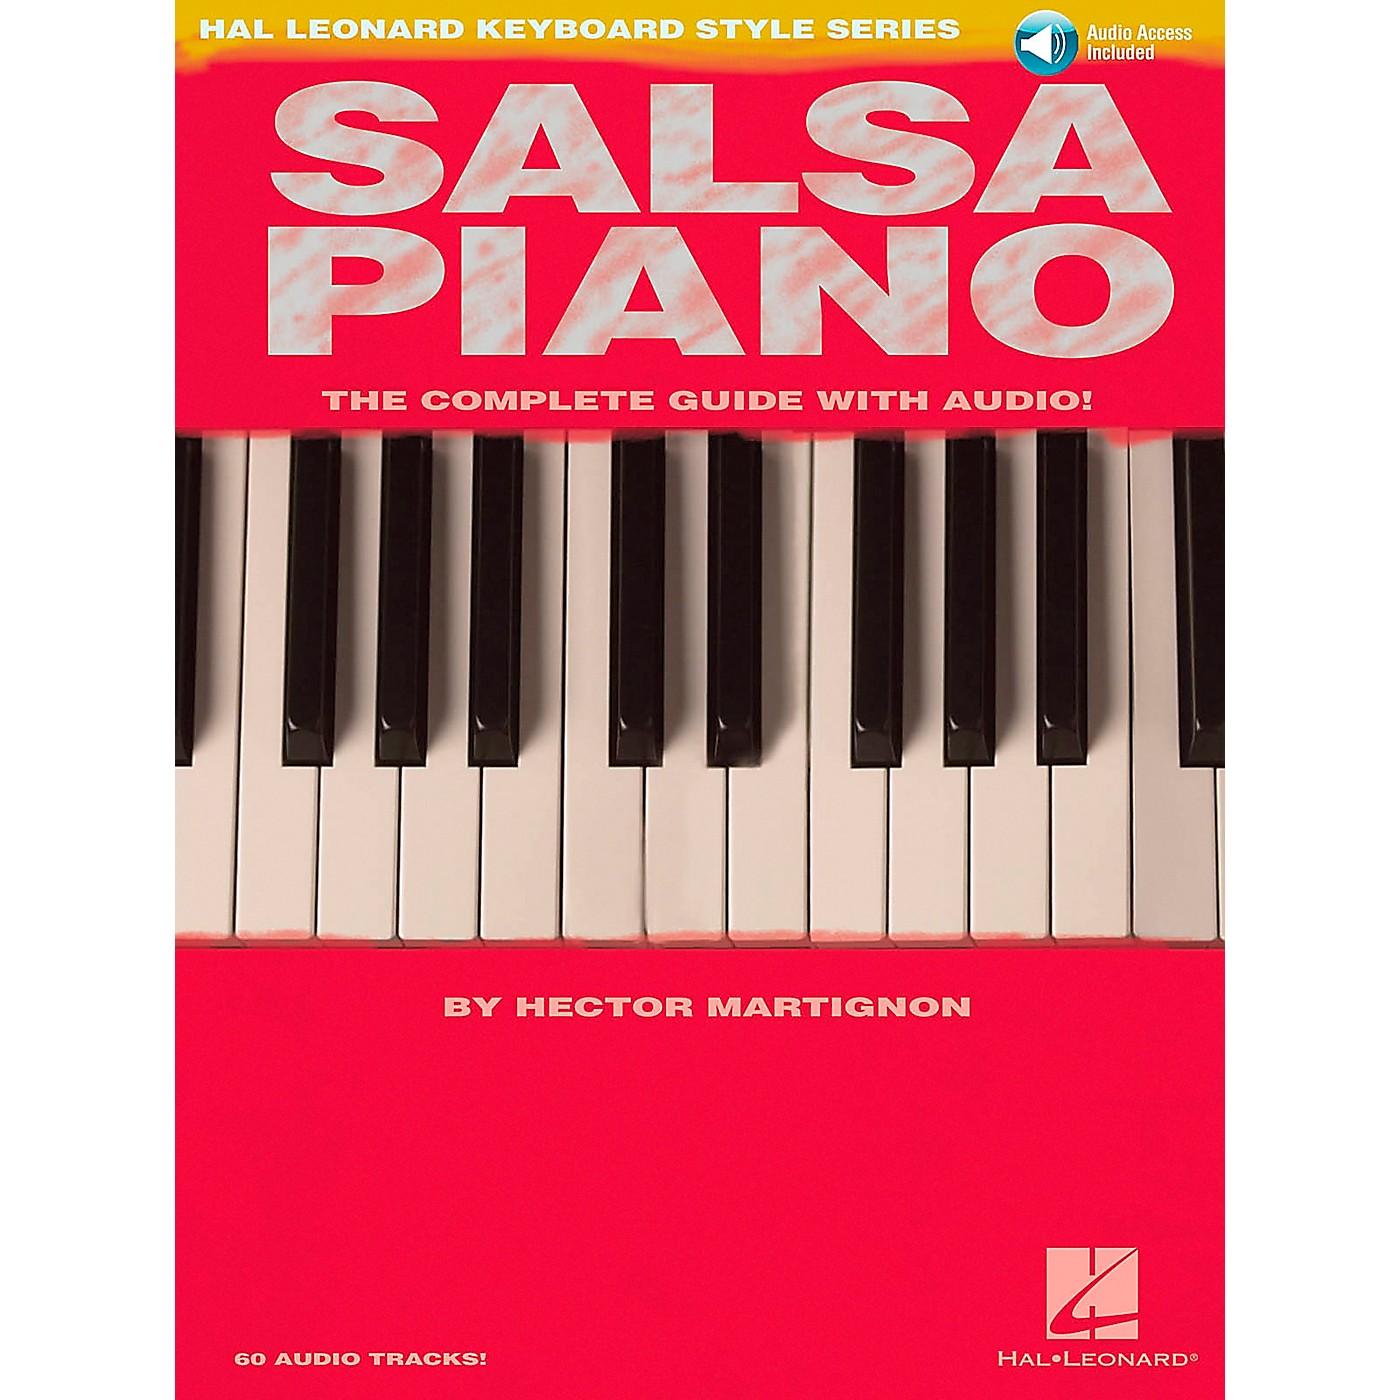 Hal Leonard Salsa Piano Book/CD Hal Leonard Keyboard Style Series thumbnail